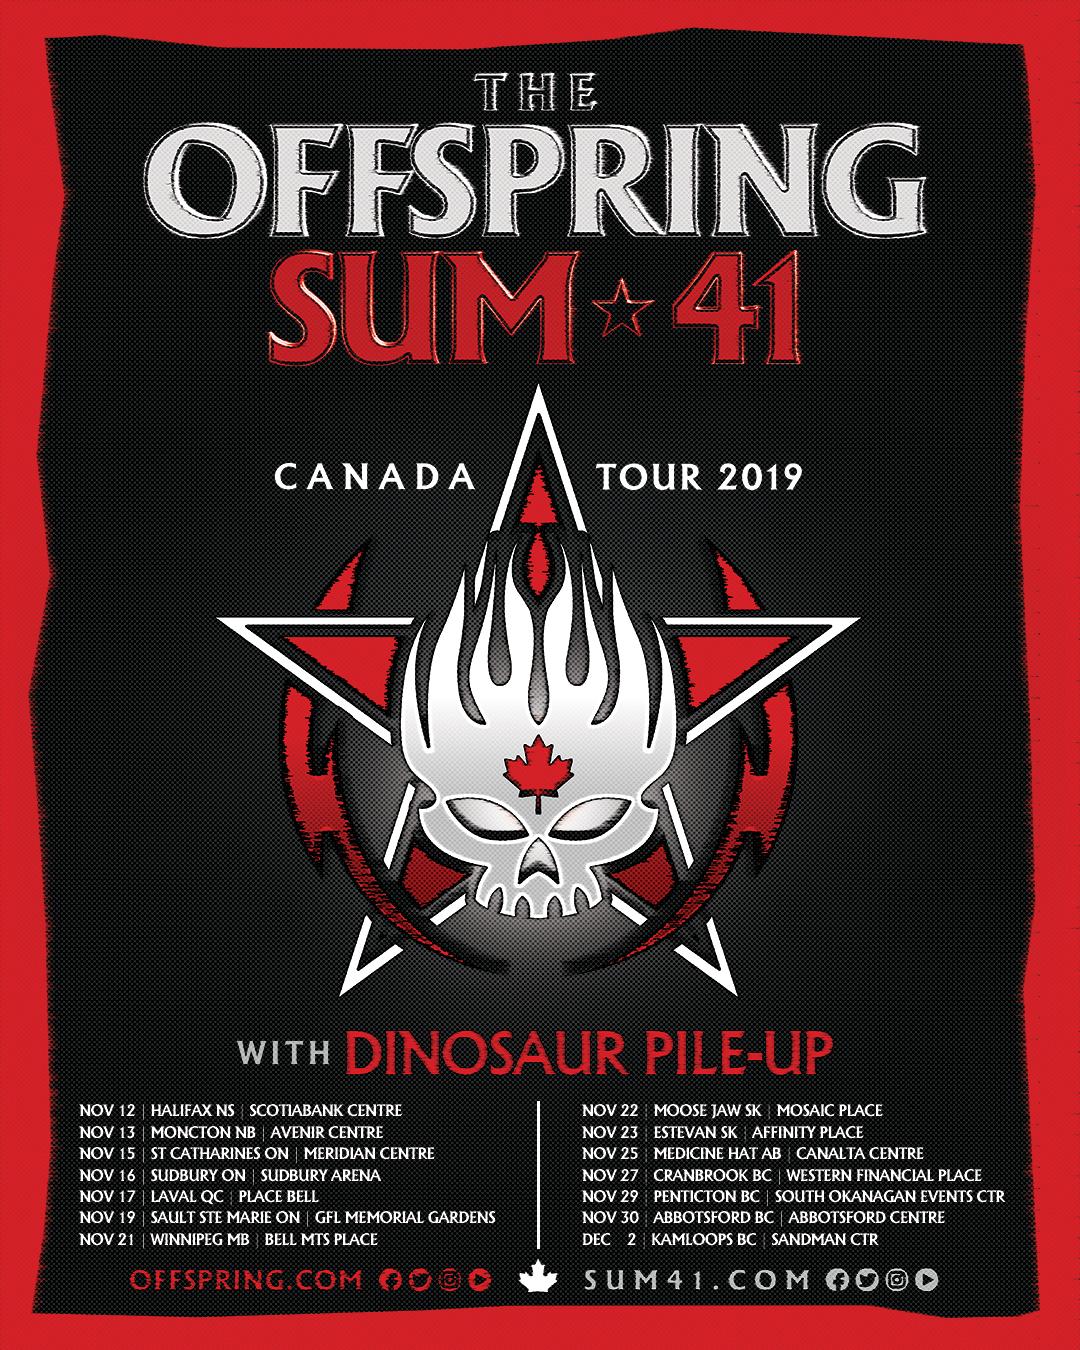 Canada Tour 2019